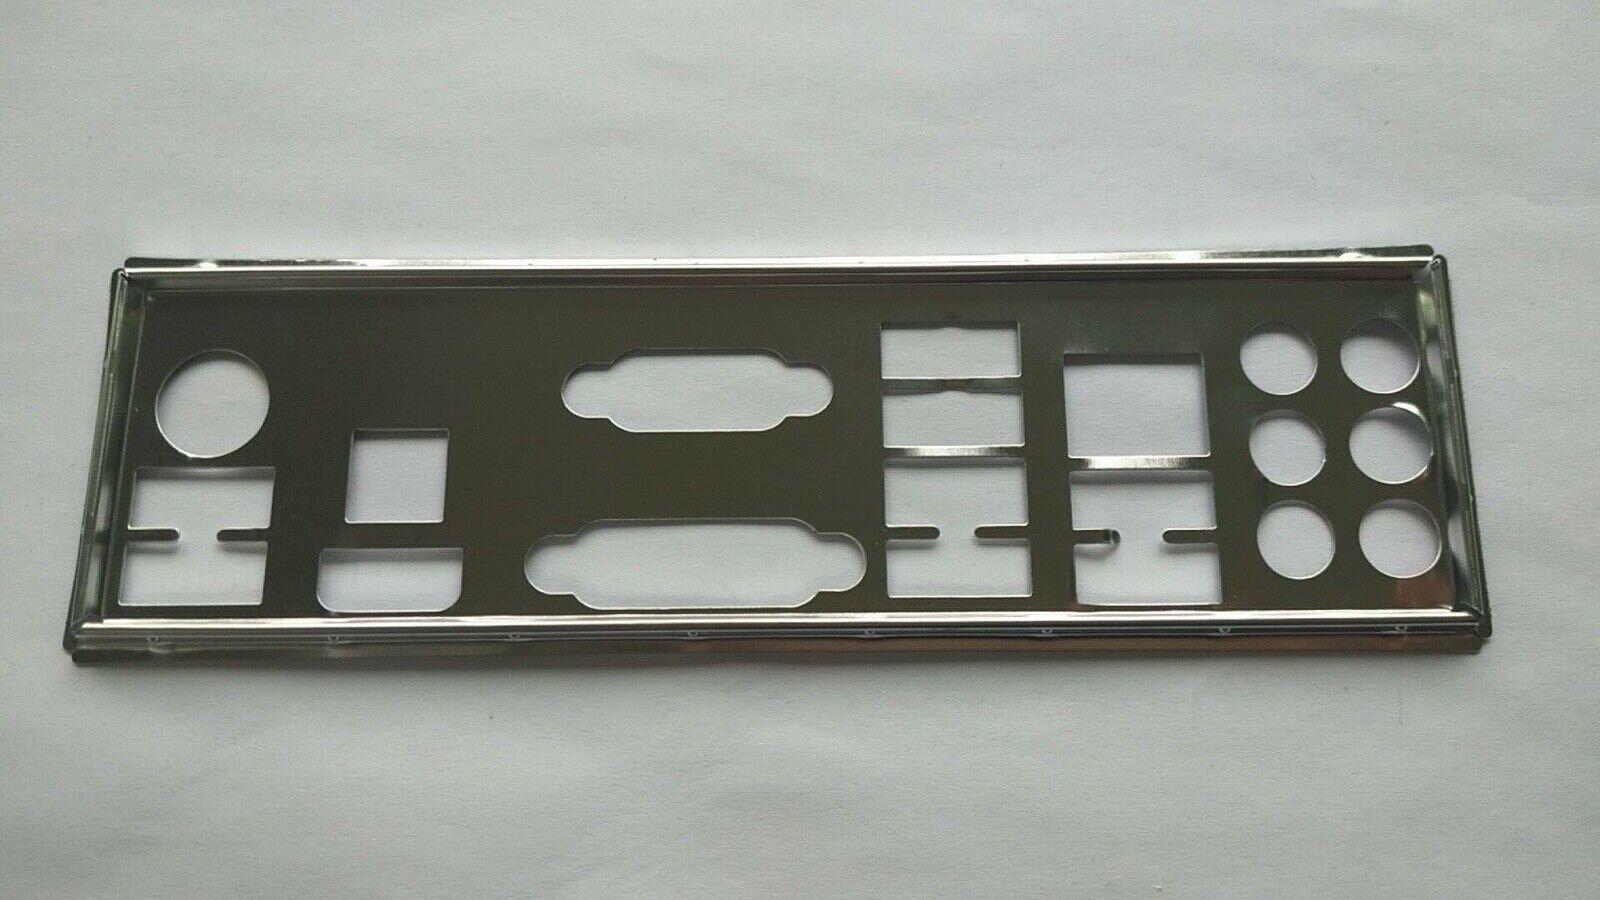 IO I//O Shield Back Plate BackPlate Plates Bracket for ASUS P8H61-MX USB3 CY